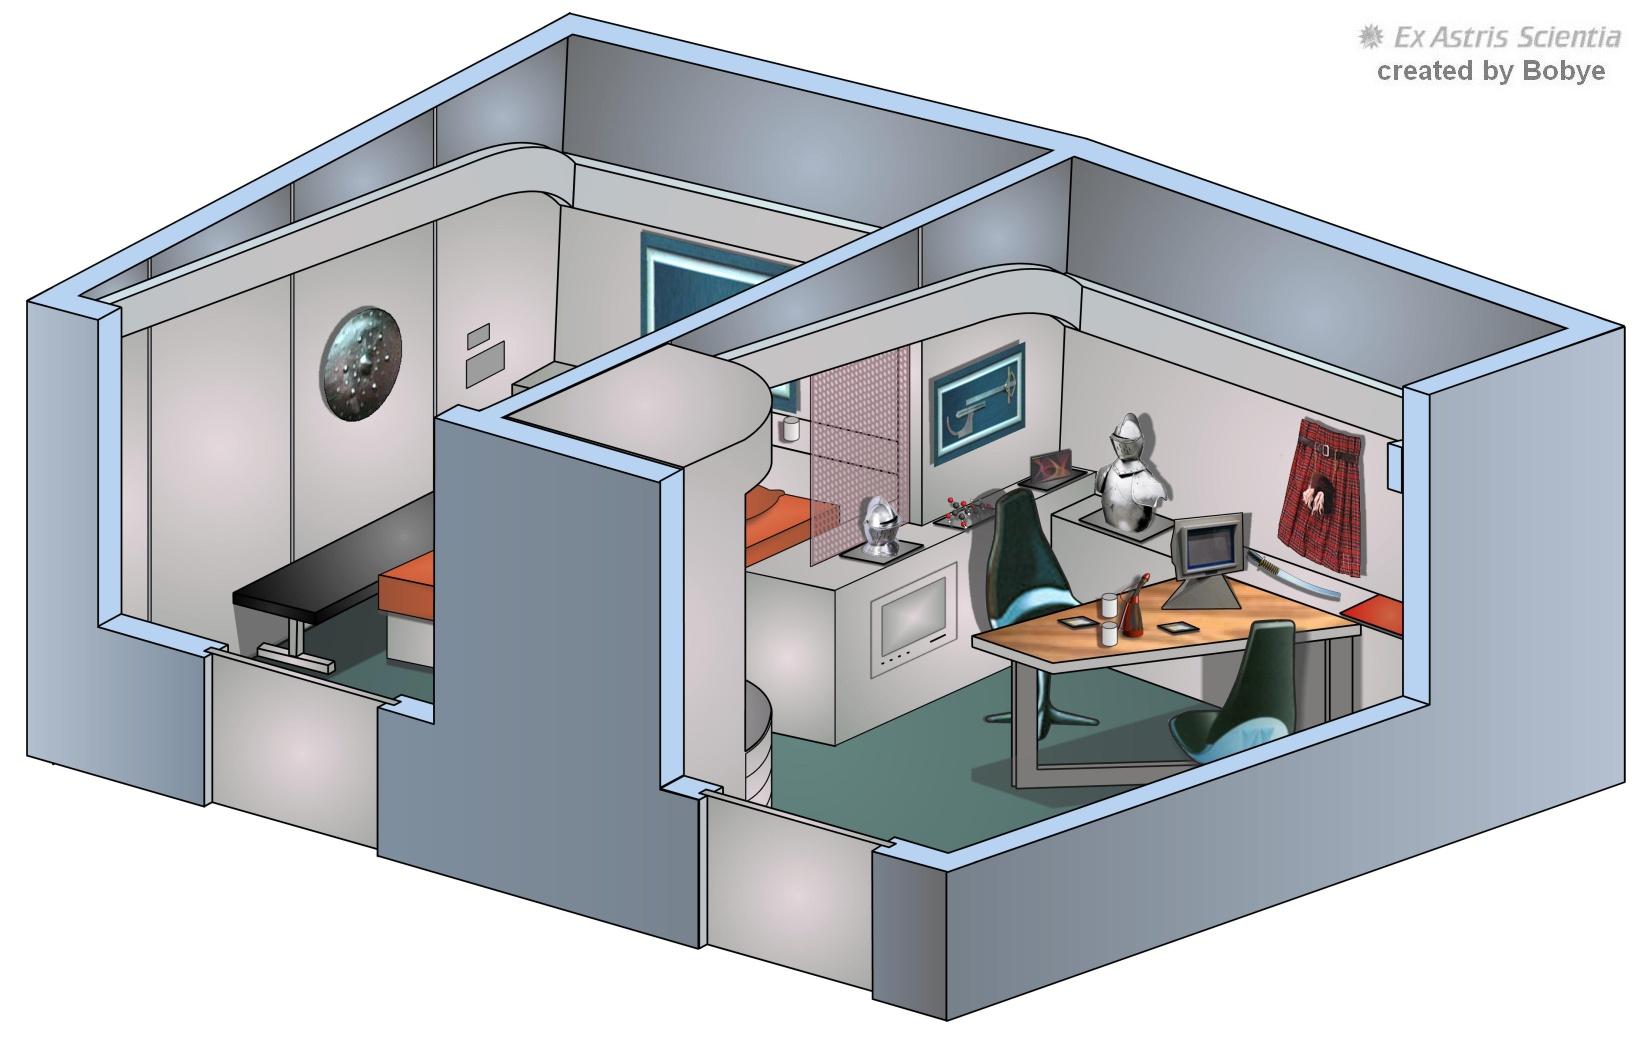 Ex Astris Scientia Galleries Original Enterprise Interiors Star Trek Engineering Schematics Scotts Quarters Created By Bobye